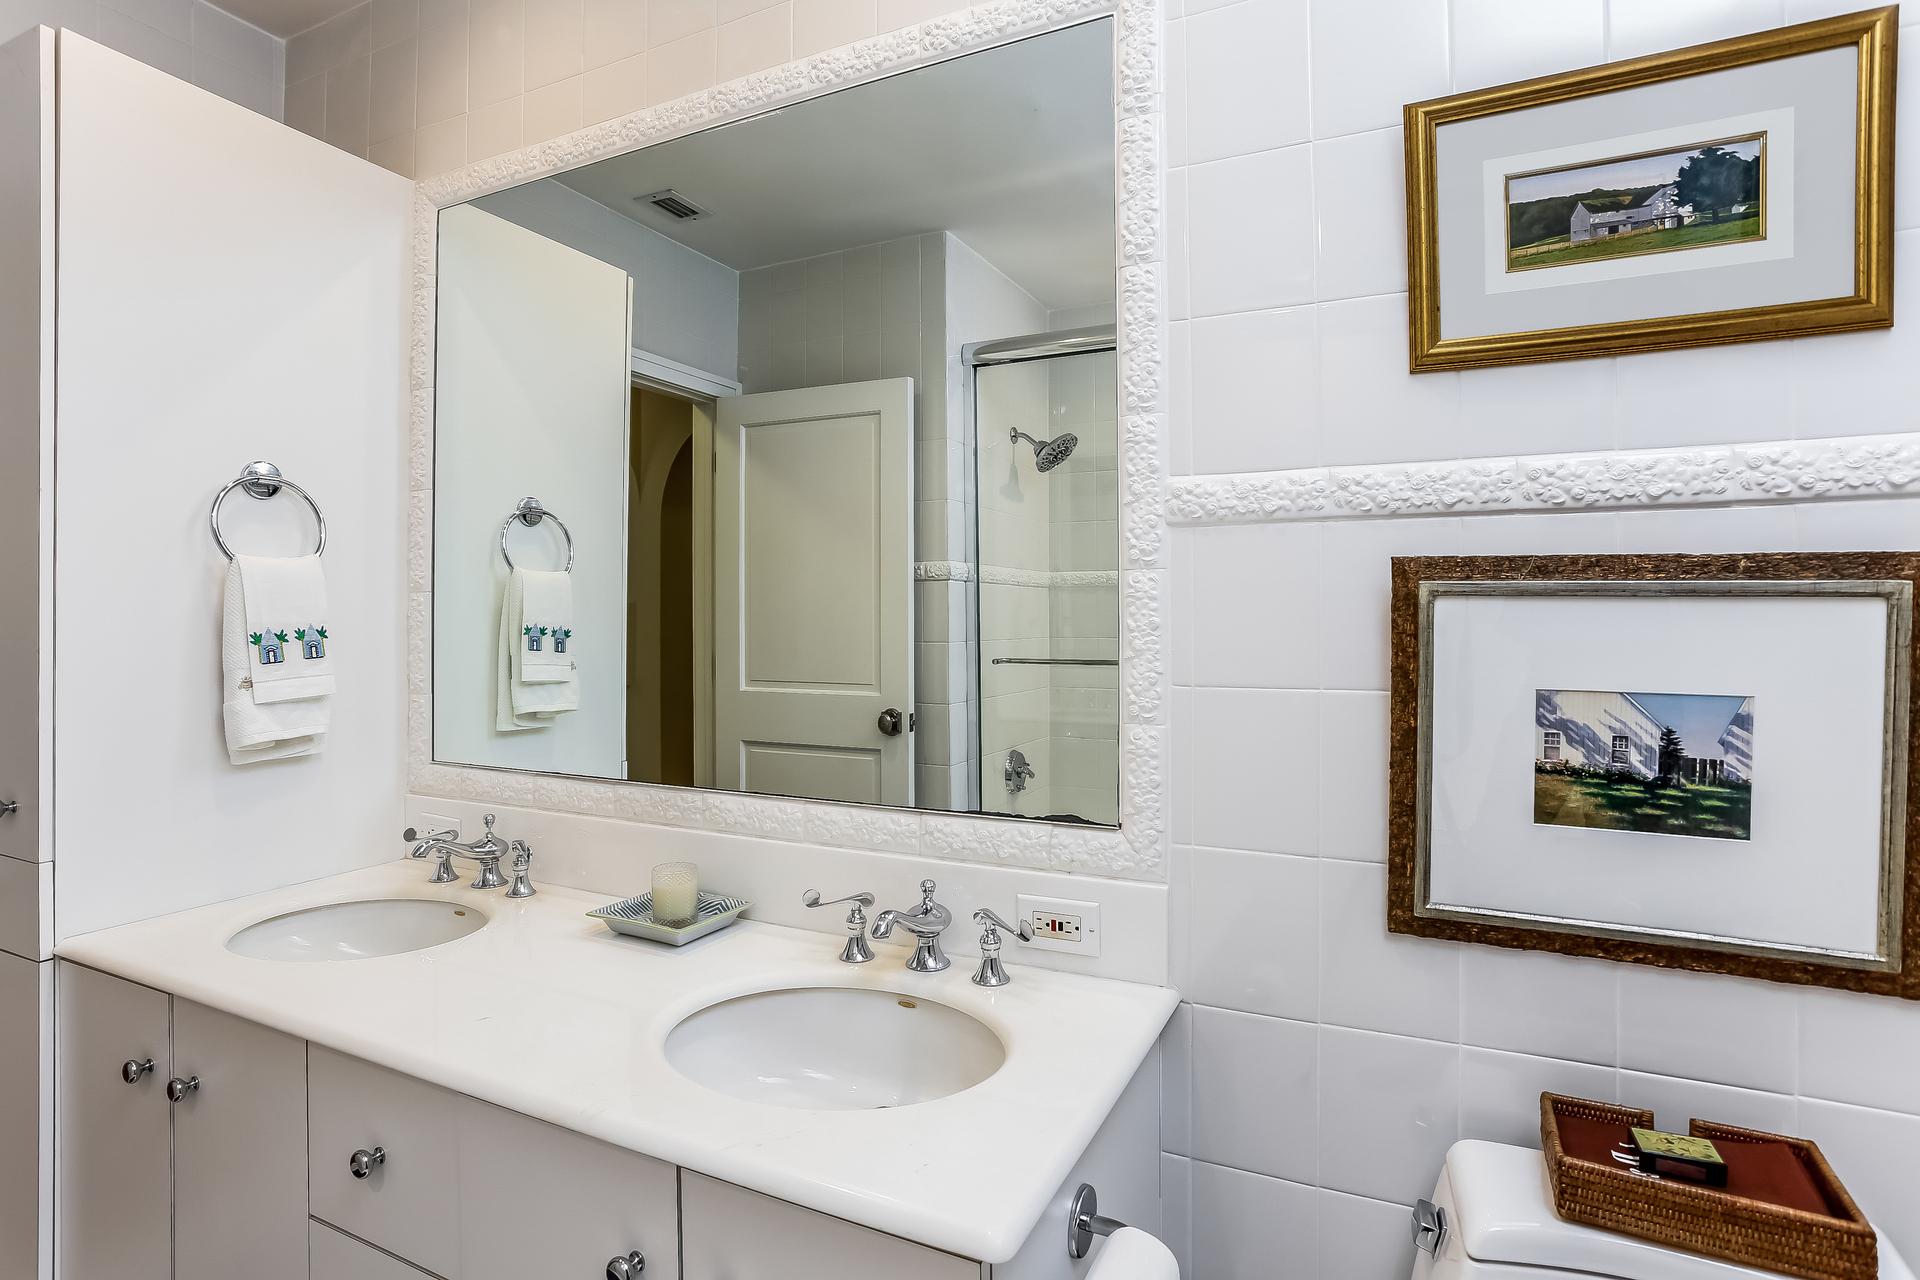 033-Bathroom-2647591-medium.jpg